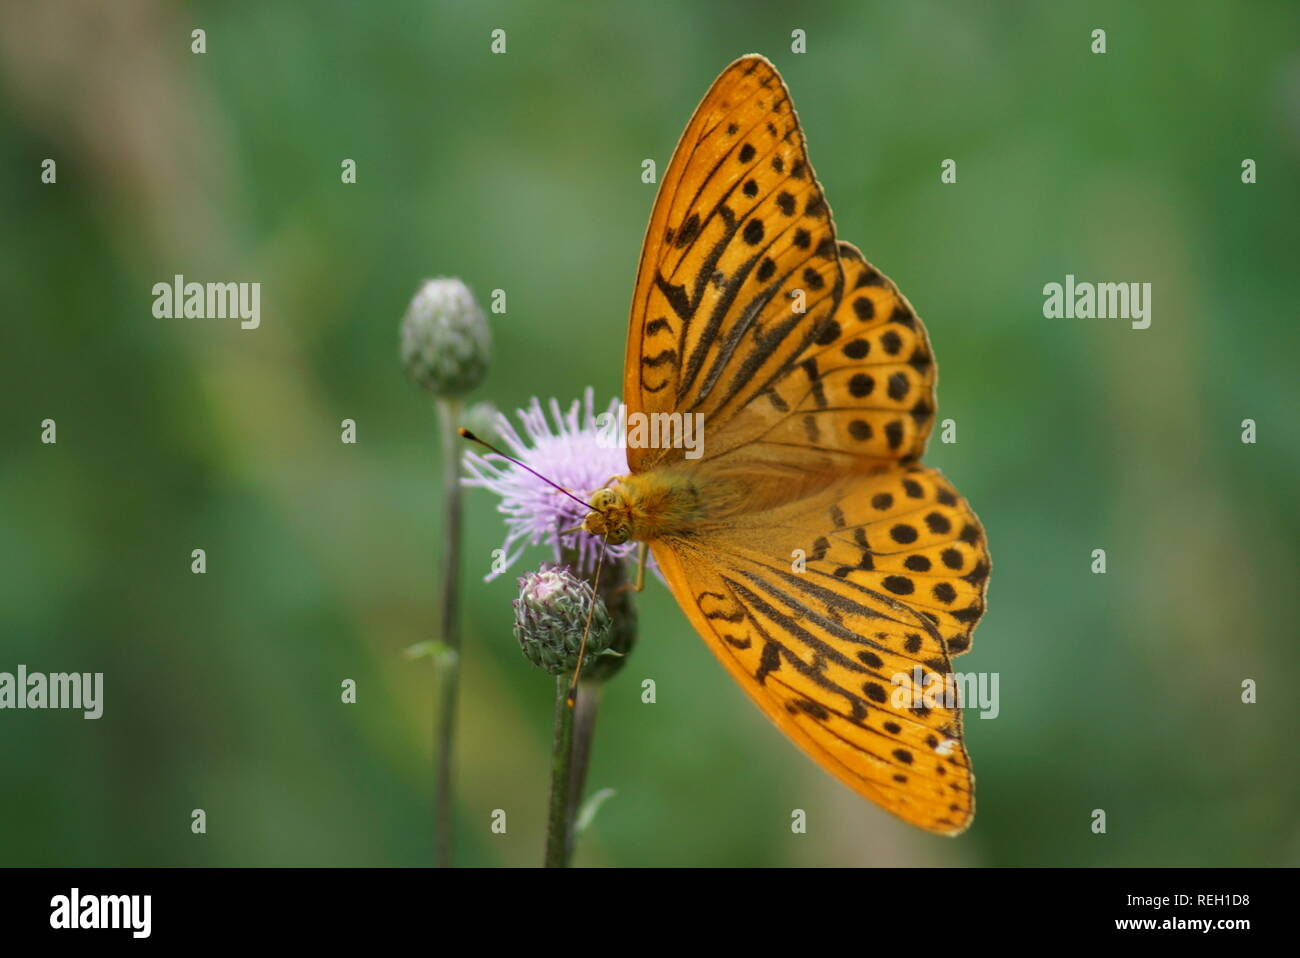 Argynnis paphia L. on pink flower green background - Stock Image